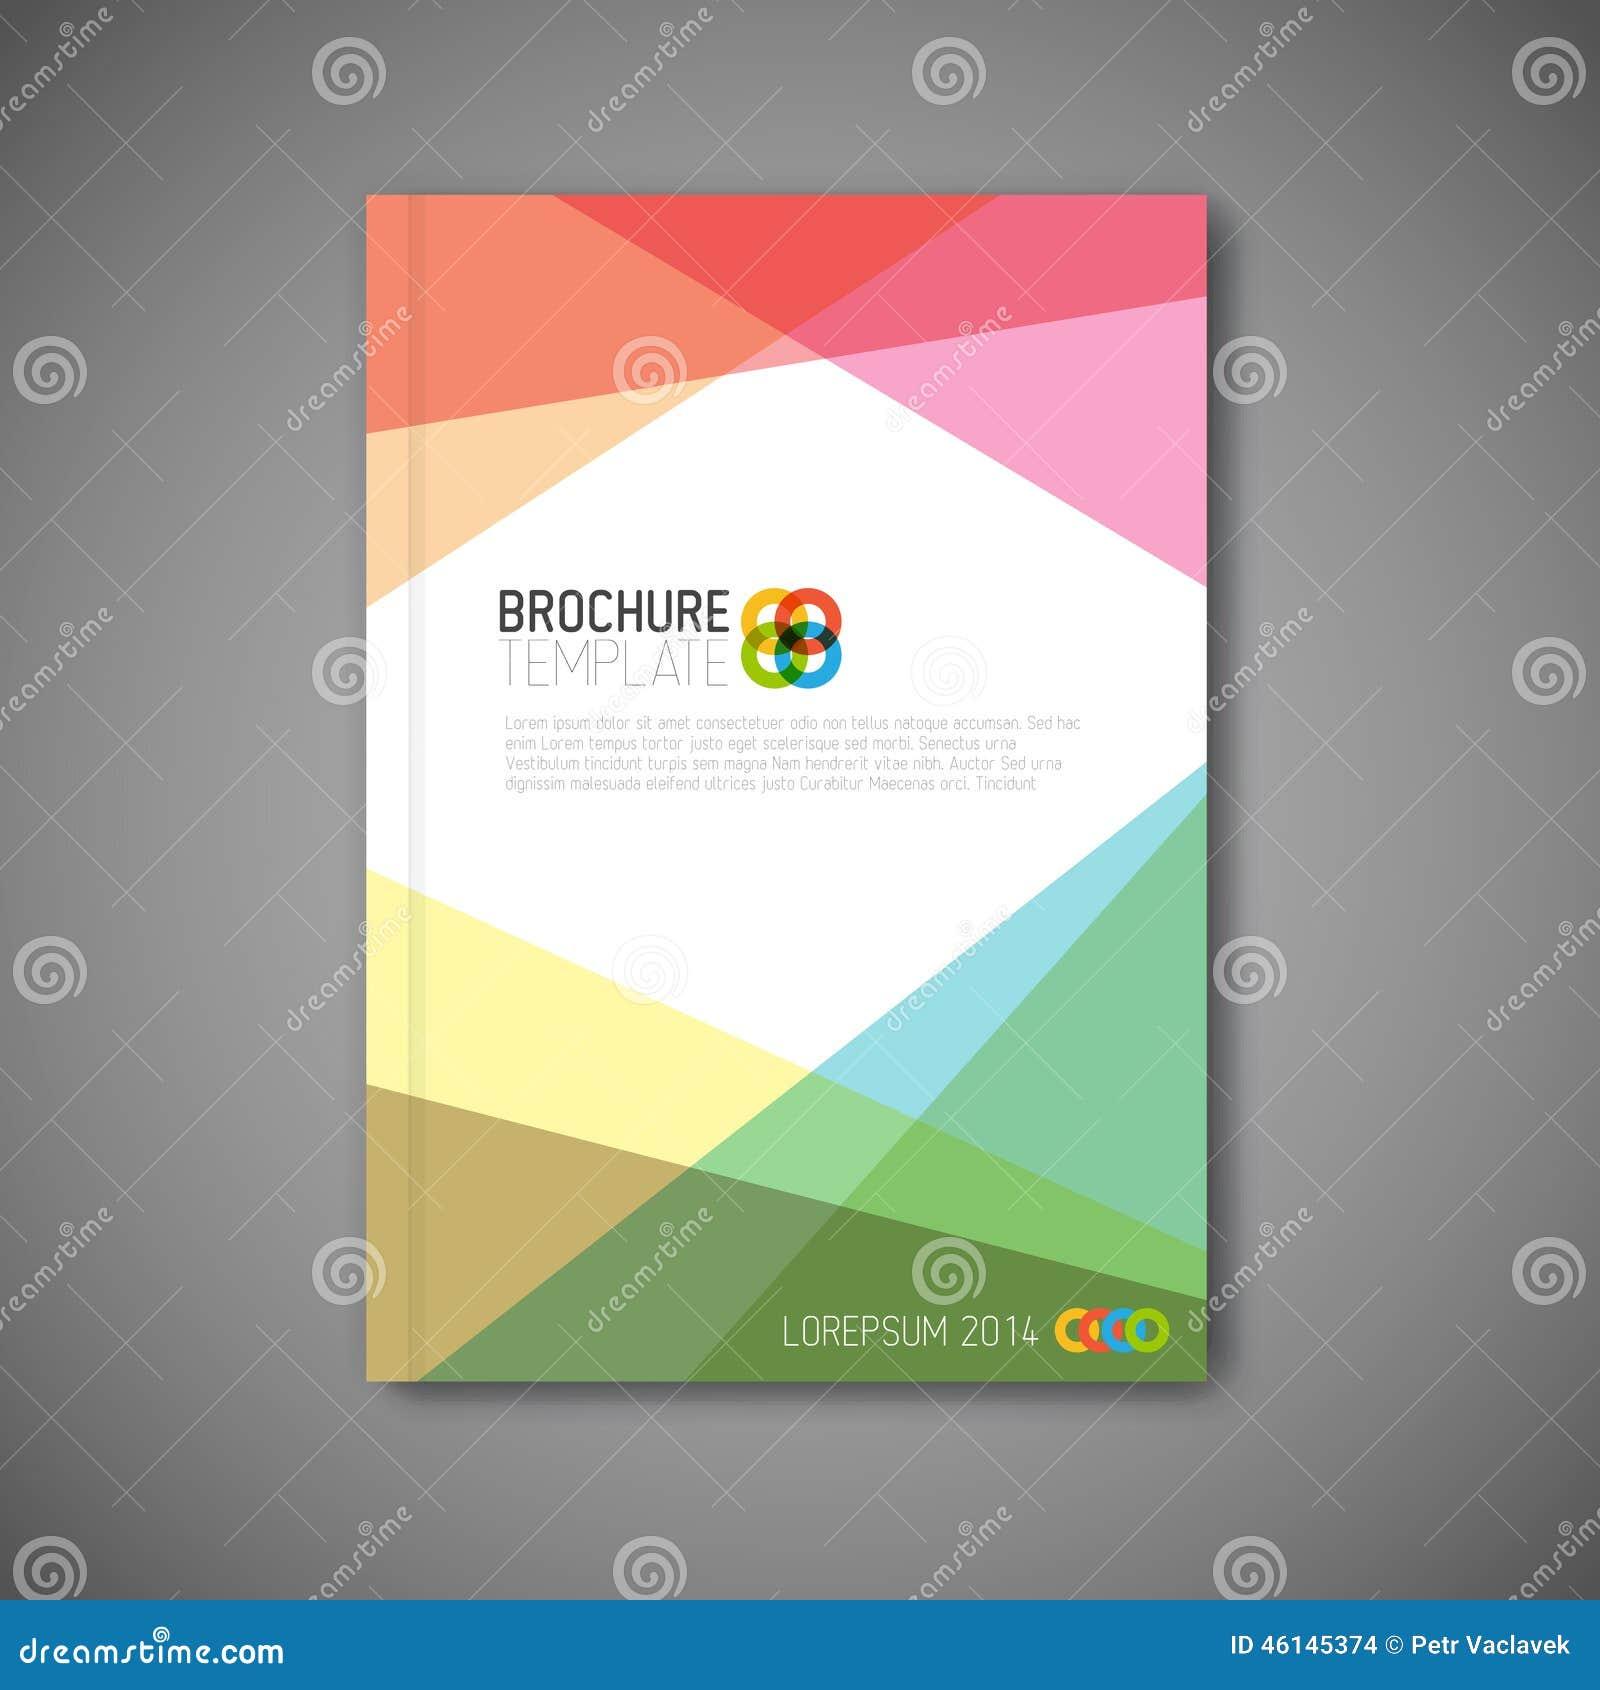 Brochure Booklet Flyer Or Book Cover Template Vector : Modern vector abstract brochure design template stock